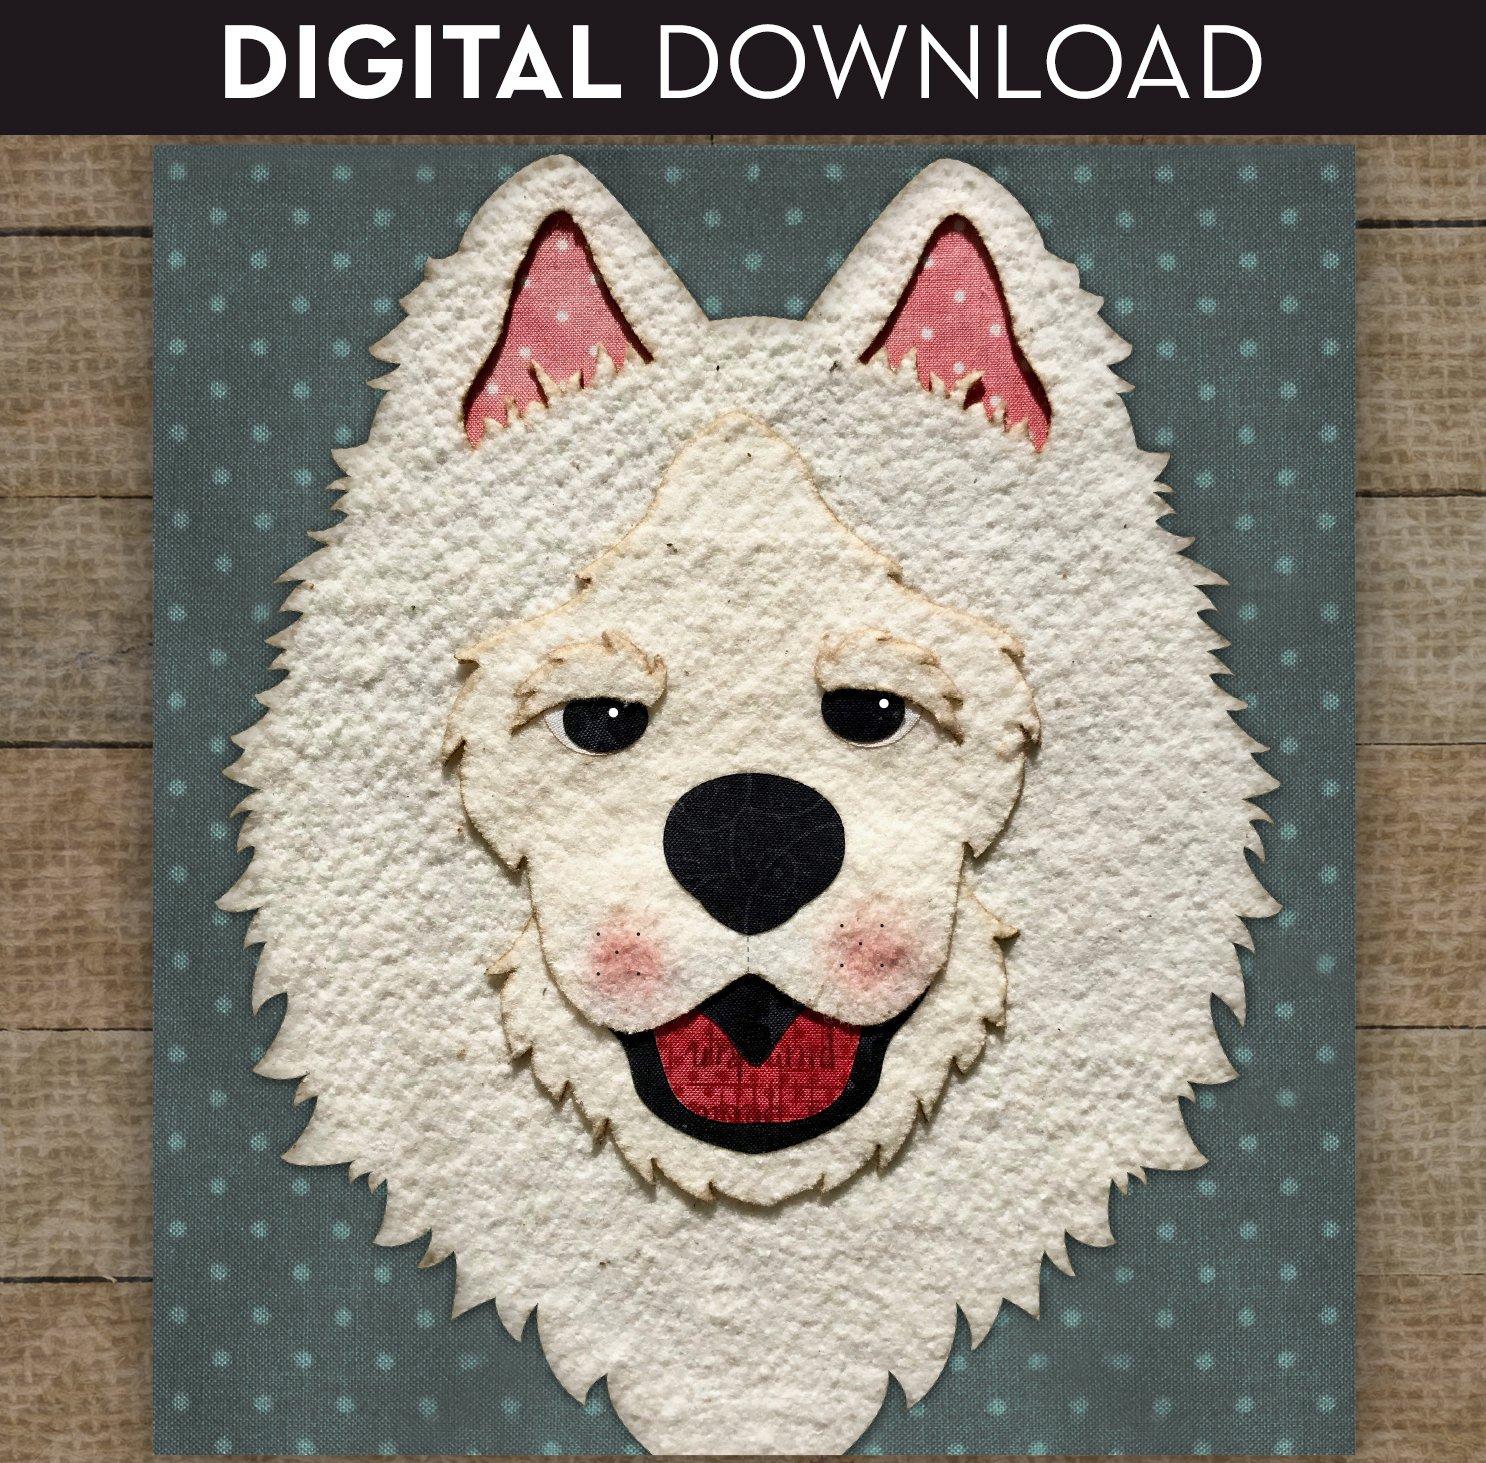 Samoyed - Download